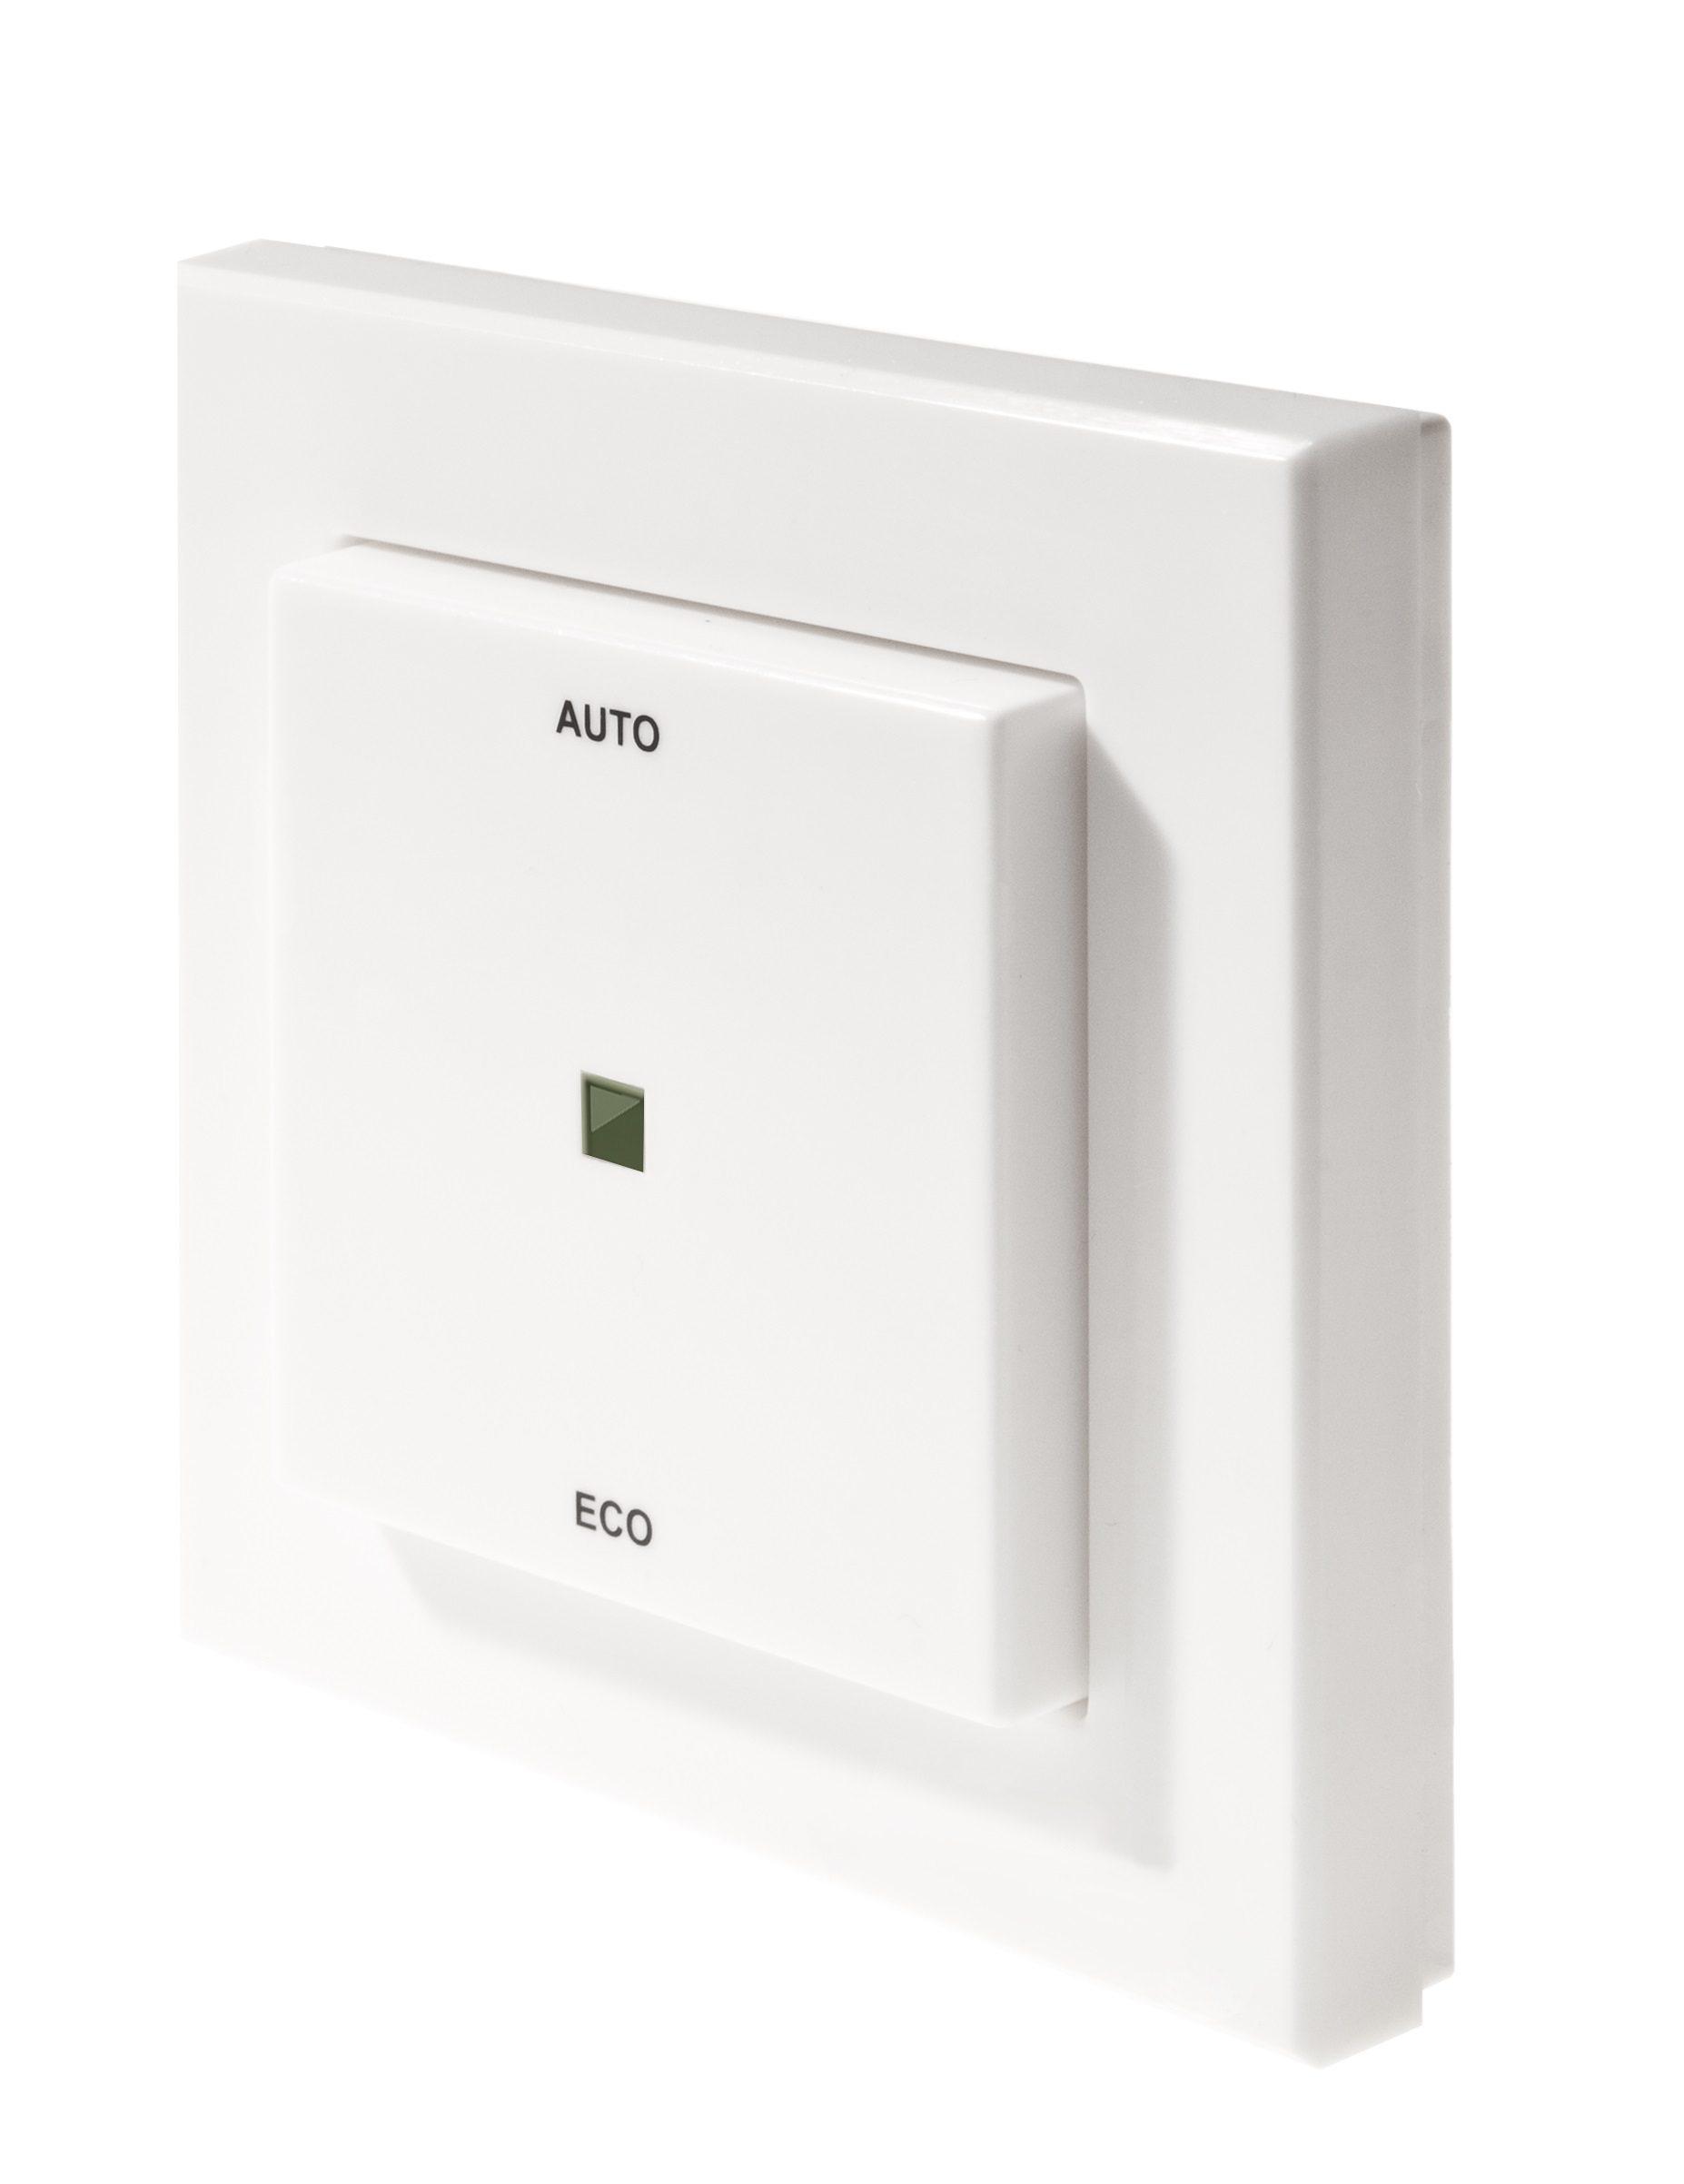 MAX! Smart Home Energie & Komfort »Eco Taster«